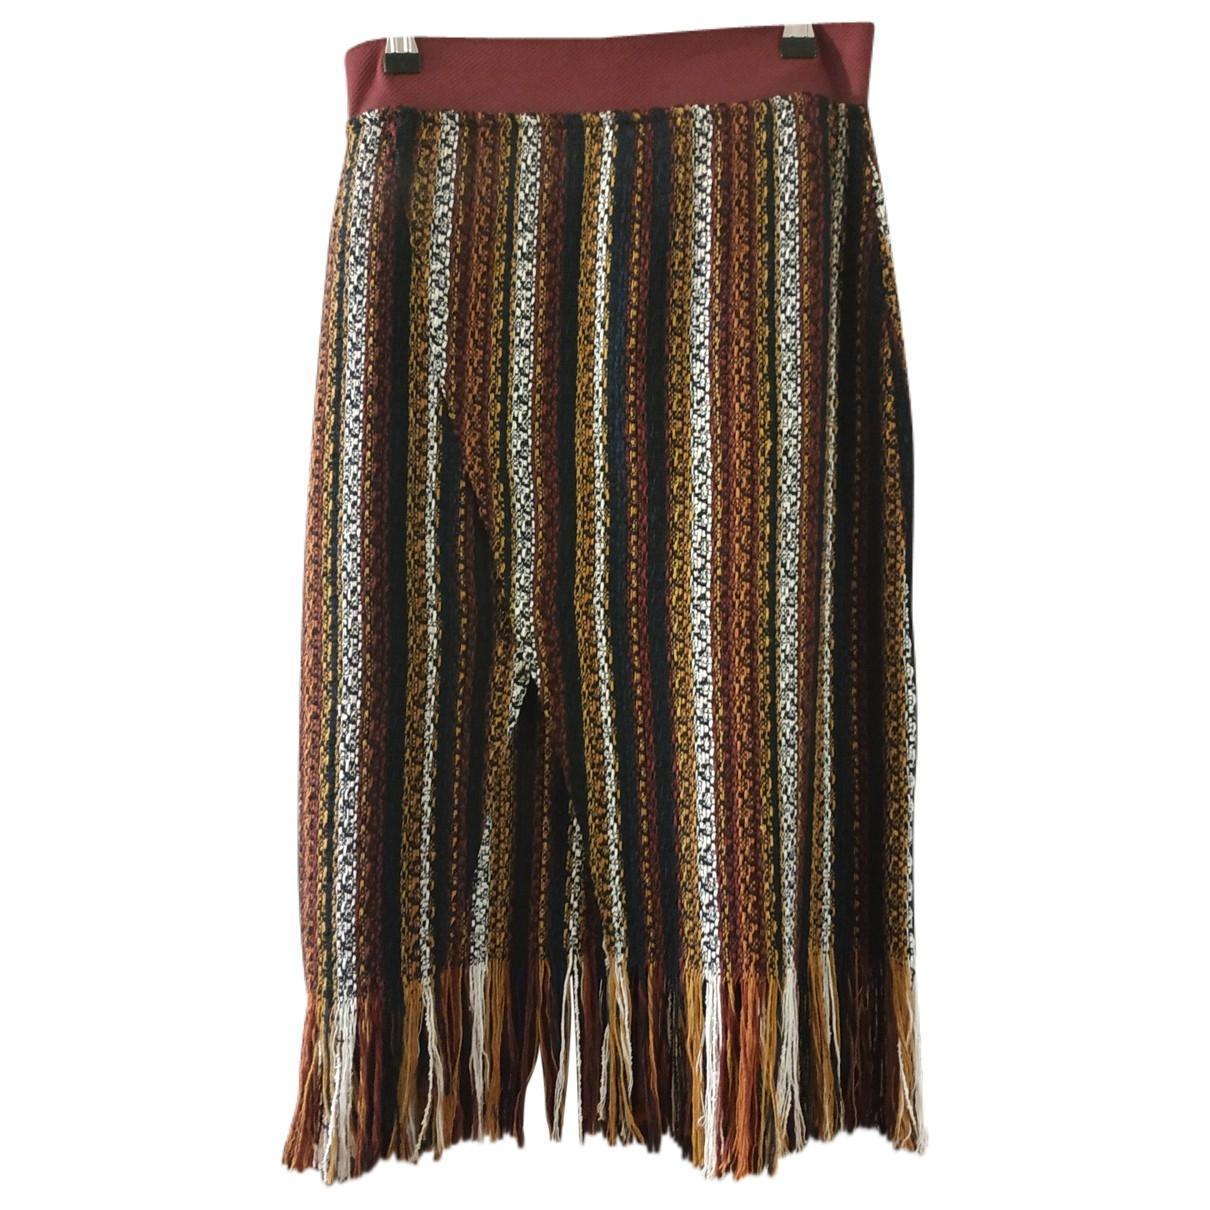 Zara - Jupe   pour femme en tweed - multicolore